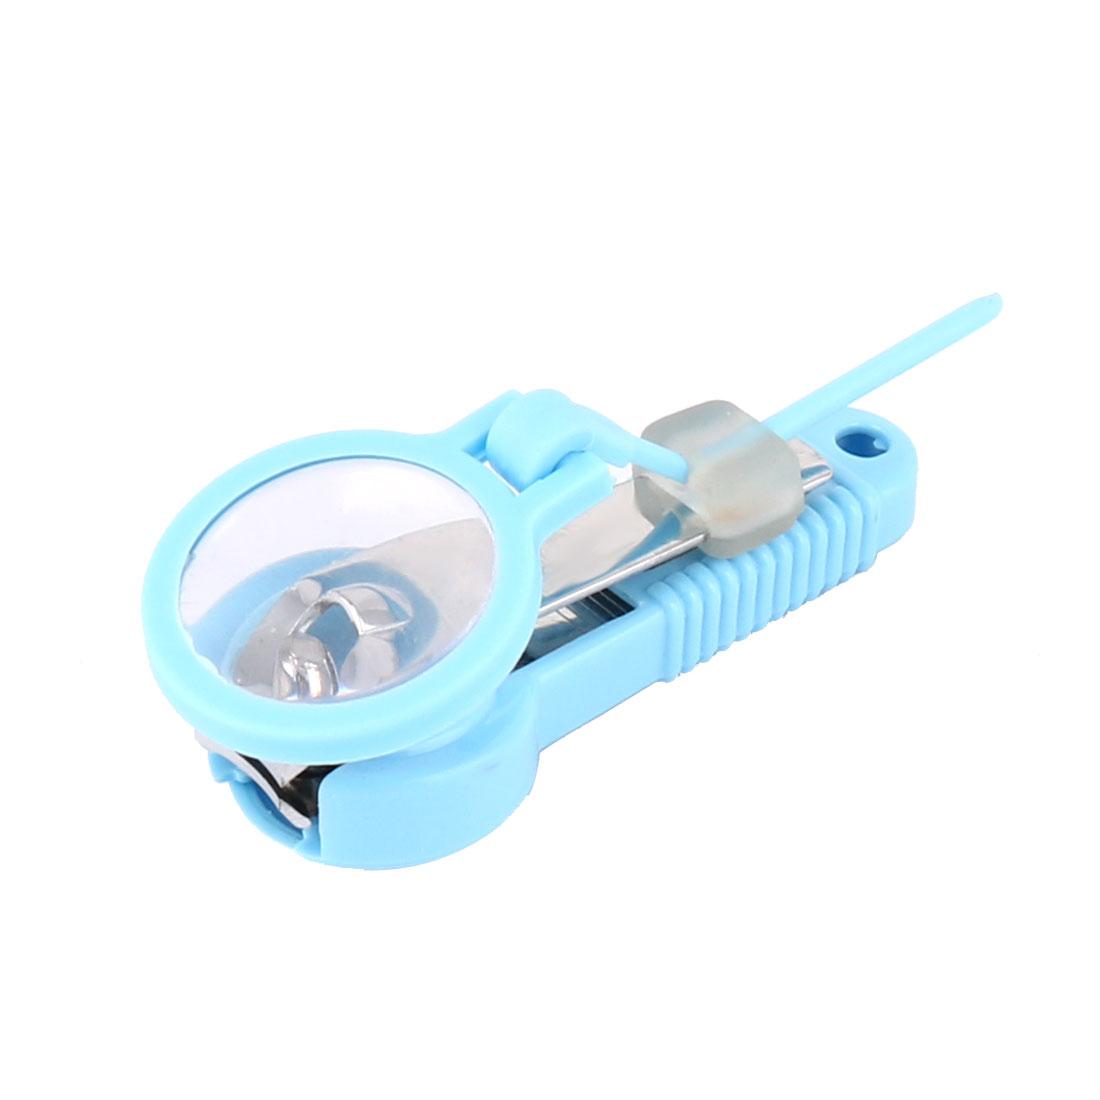 Personal Manicure Care Plastic Grip Toe Nail Clipper File w Magnifier